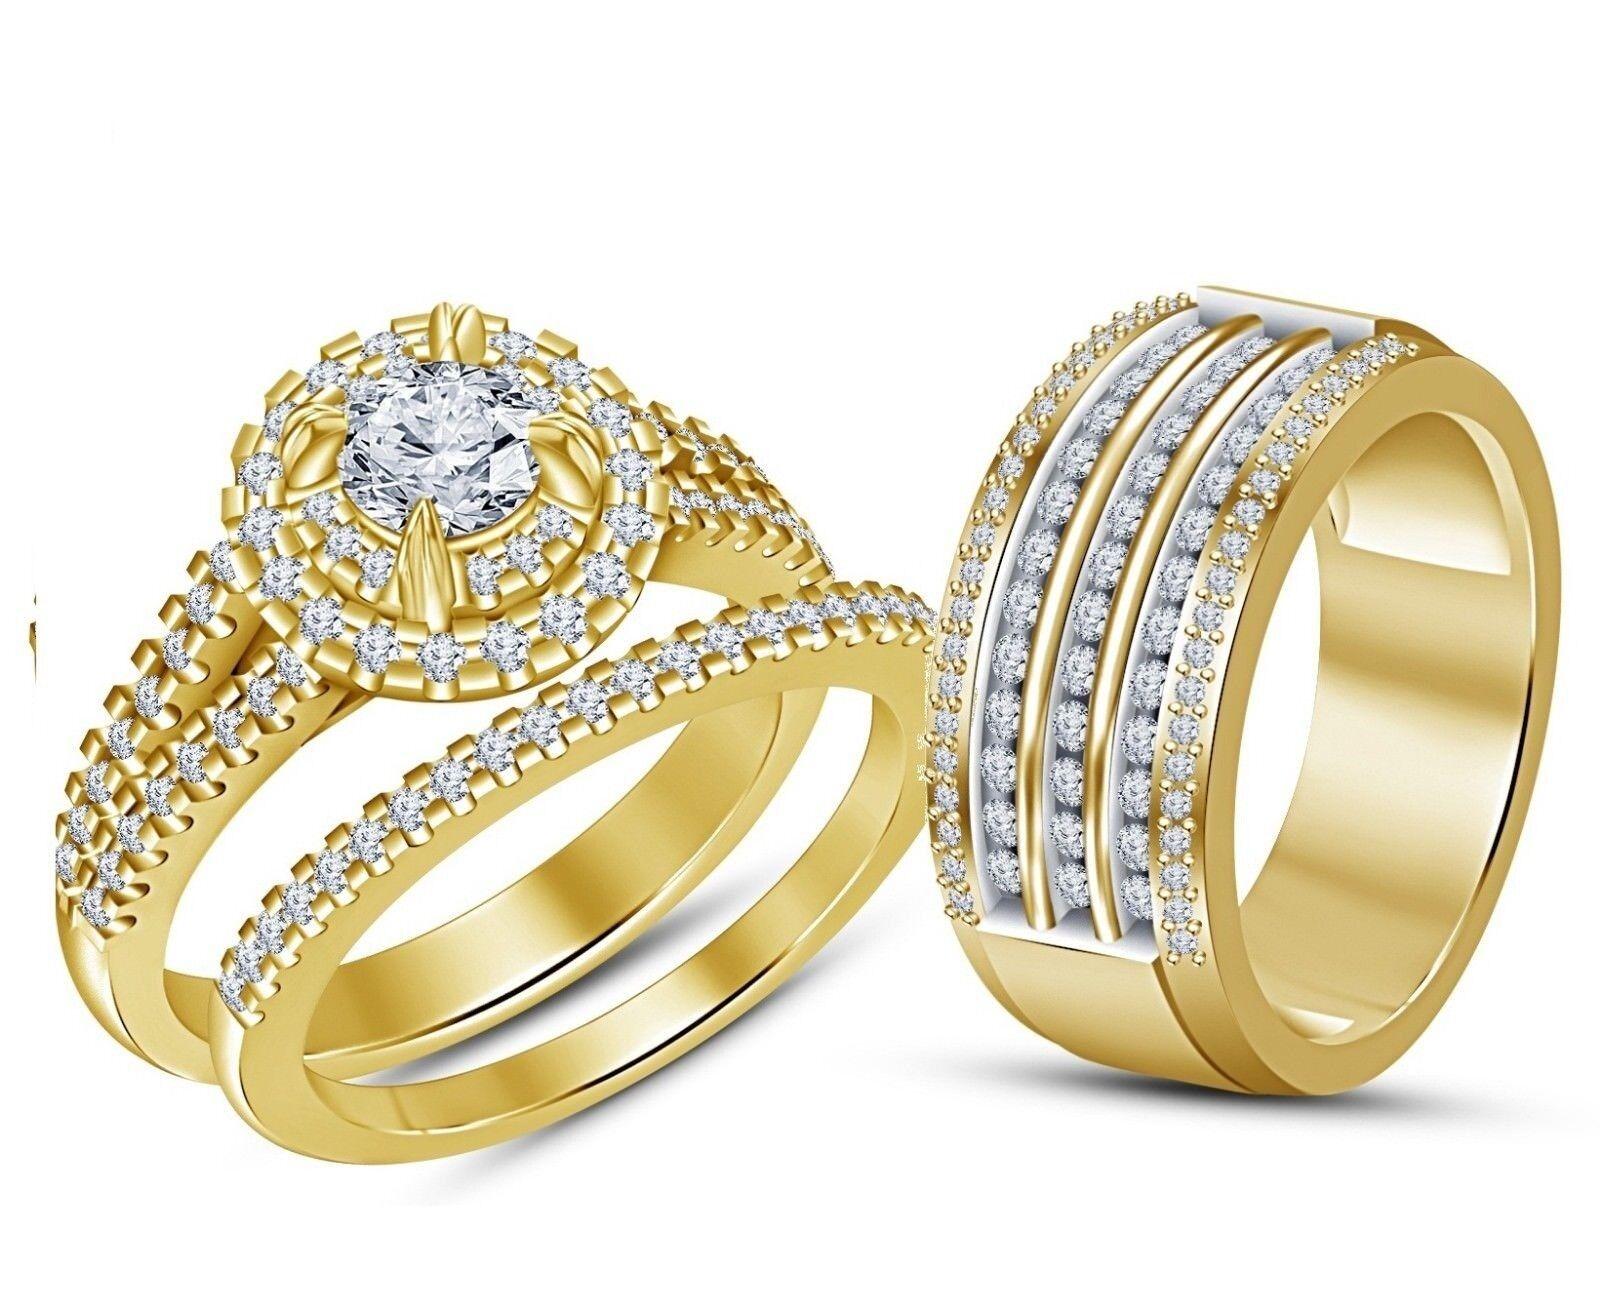 Men's And Women's 14K Yellow gold Over 2 Ct D VVS1 Diamond Wedding Trio Ring Set